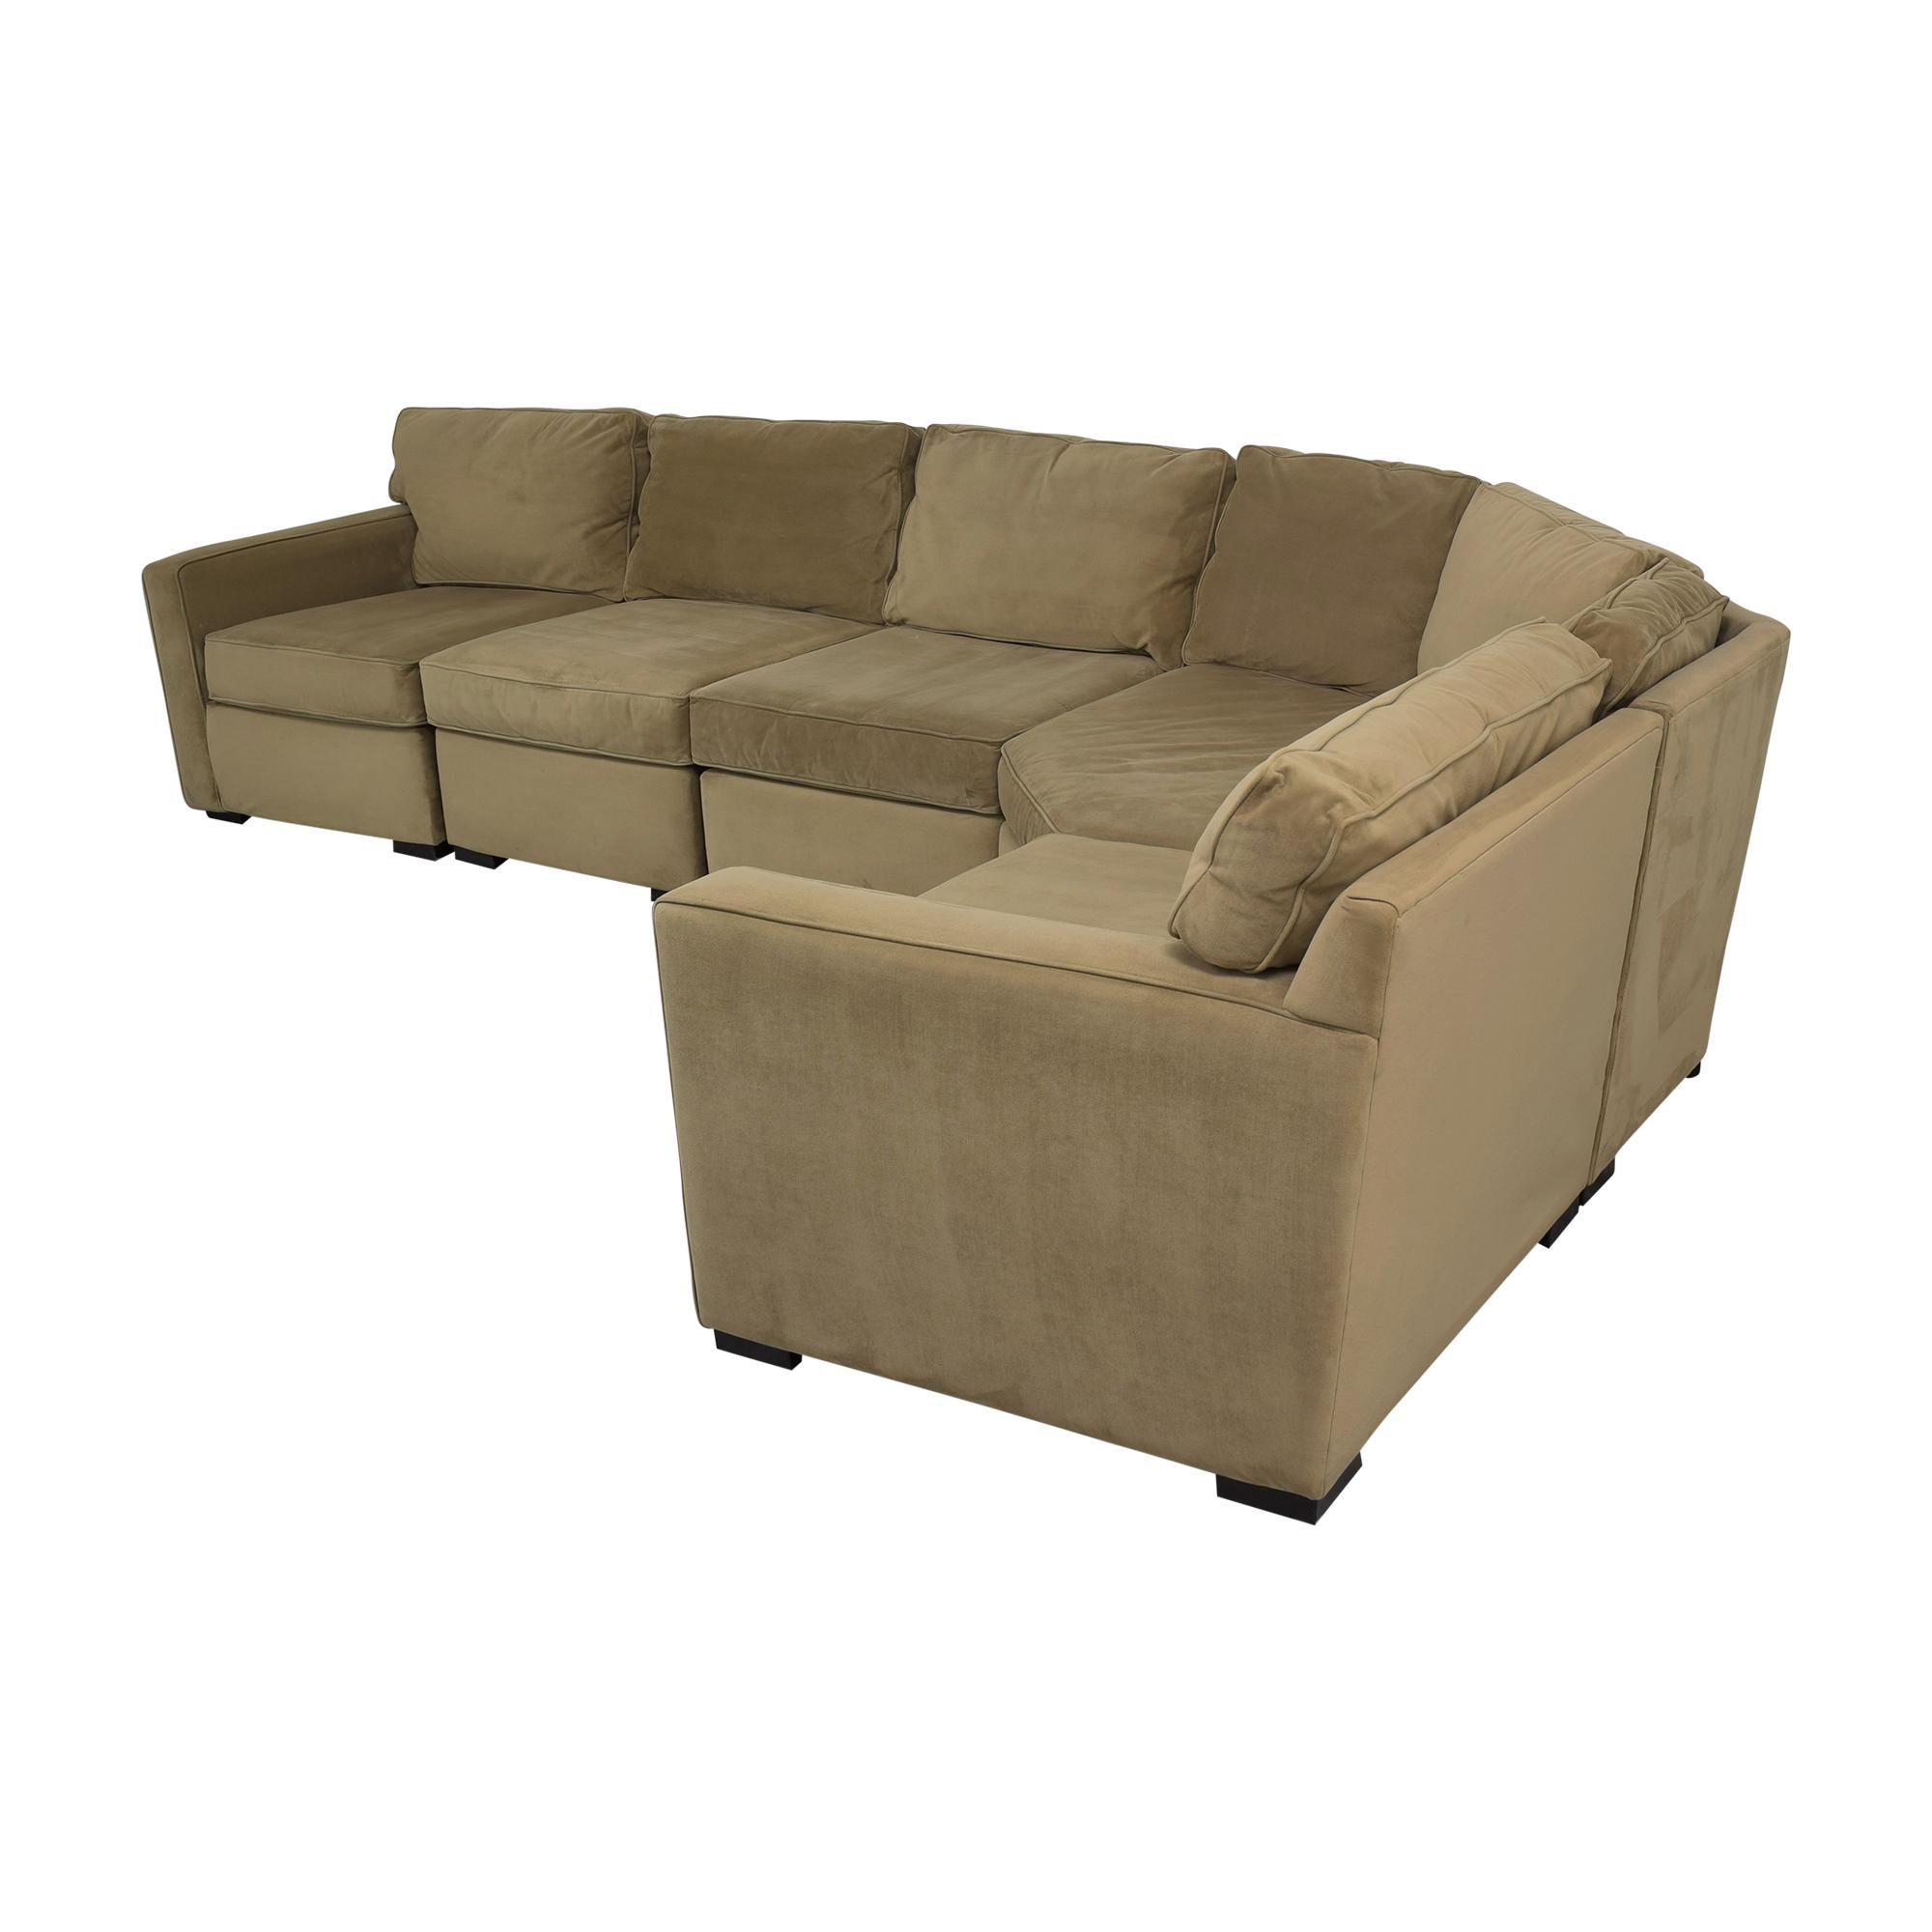 Macy's Macy's Jonathan Louis Corner Sectional Sofa nj